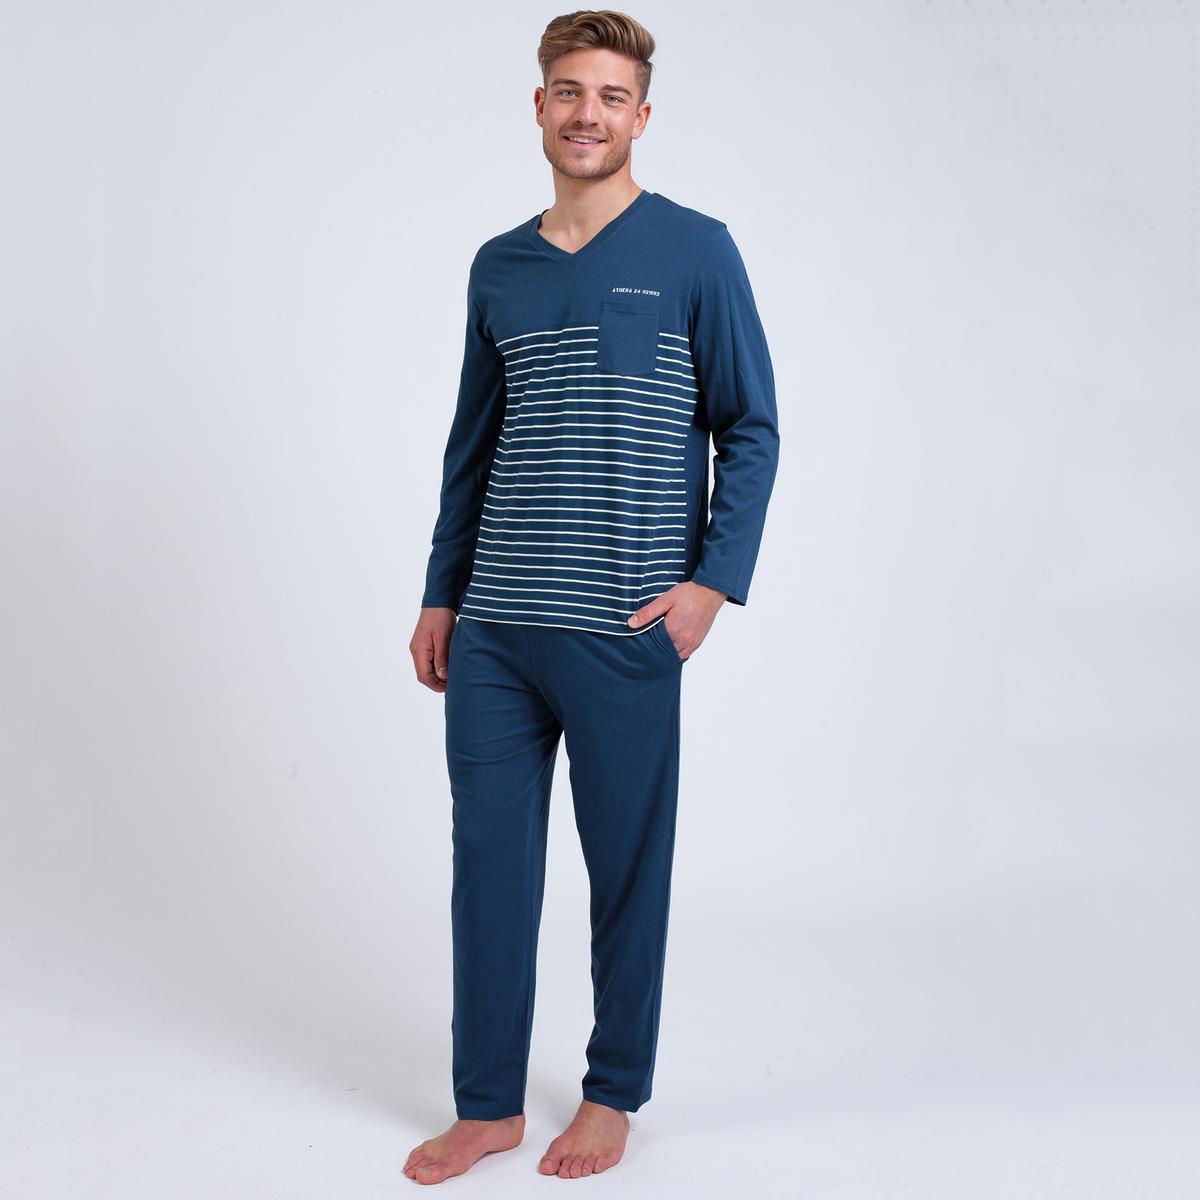 Пижама La Redoute длинная в полоску S синий цена 2017